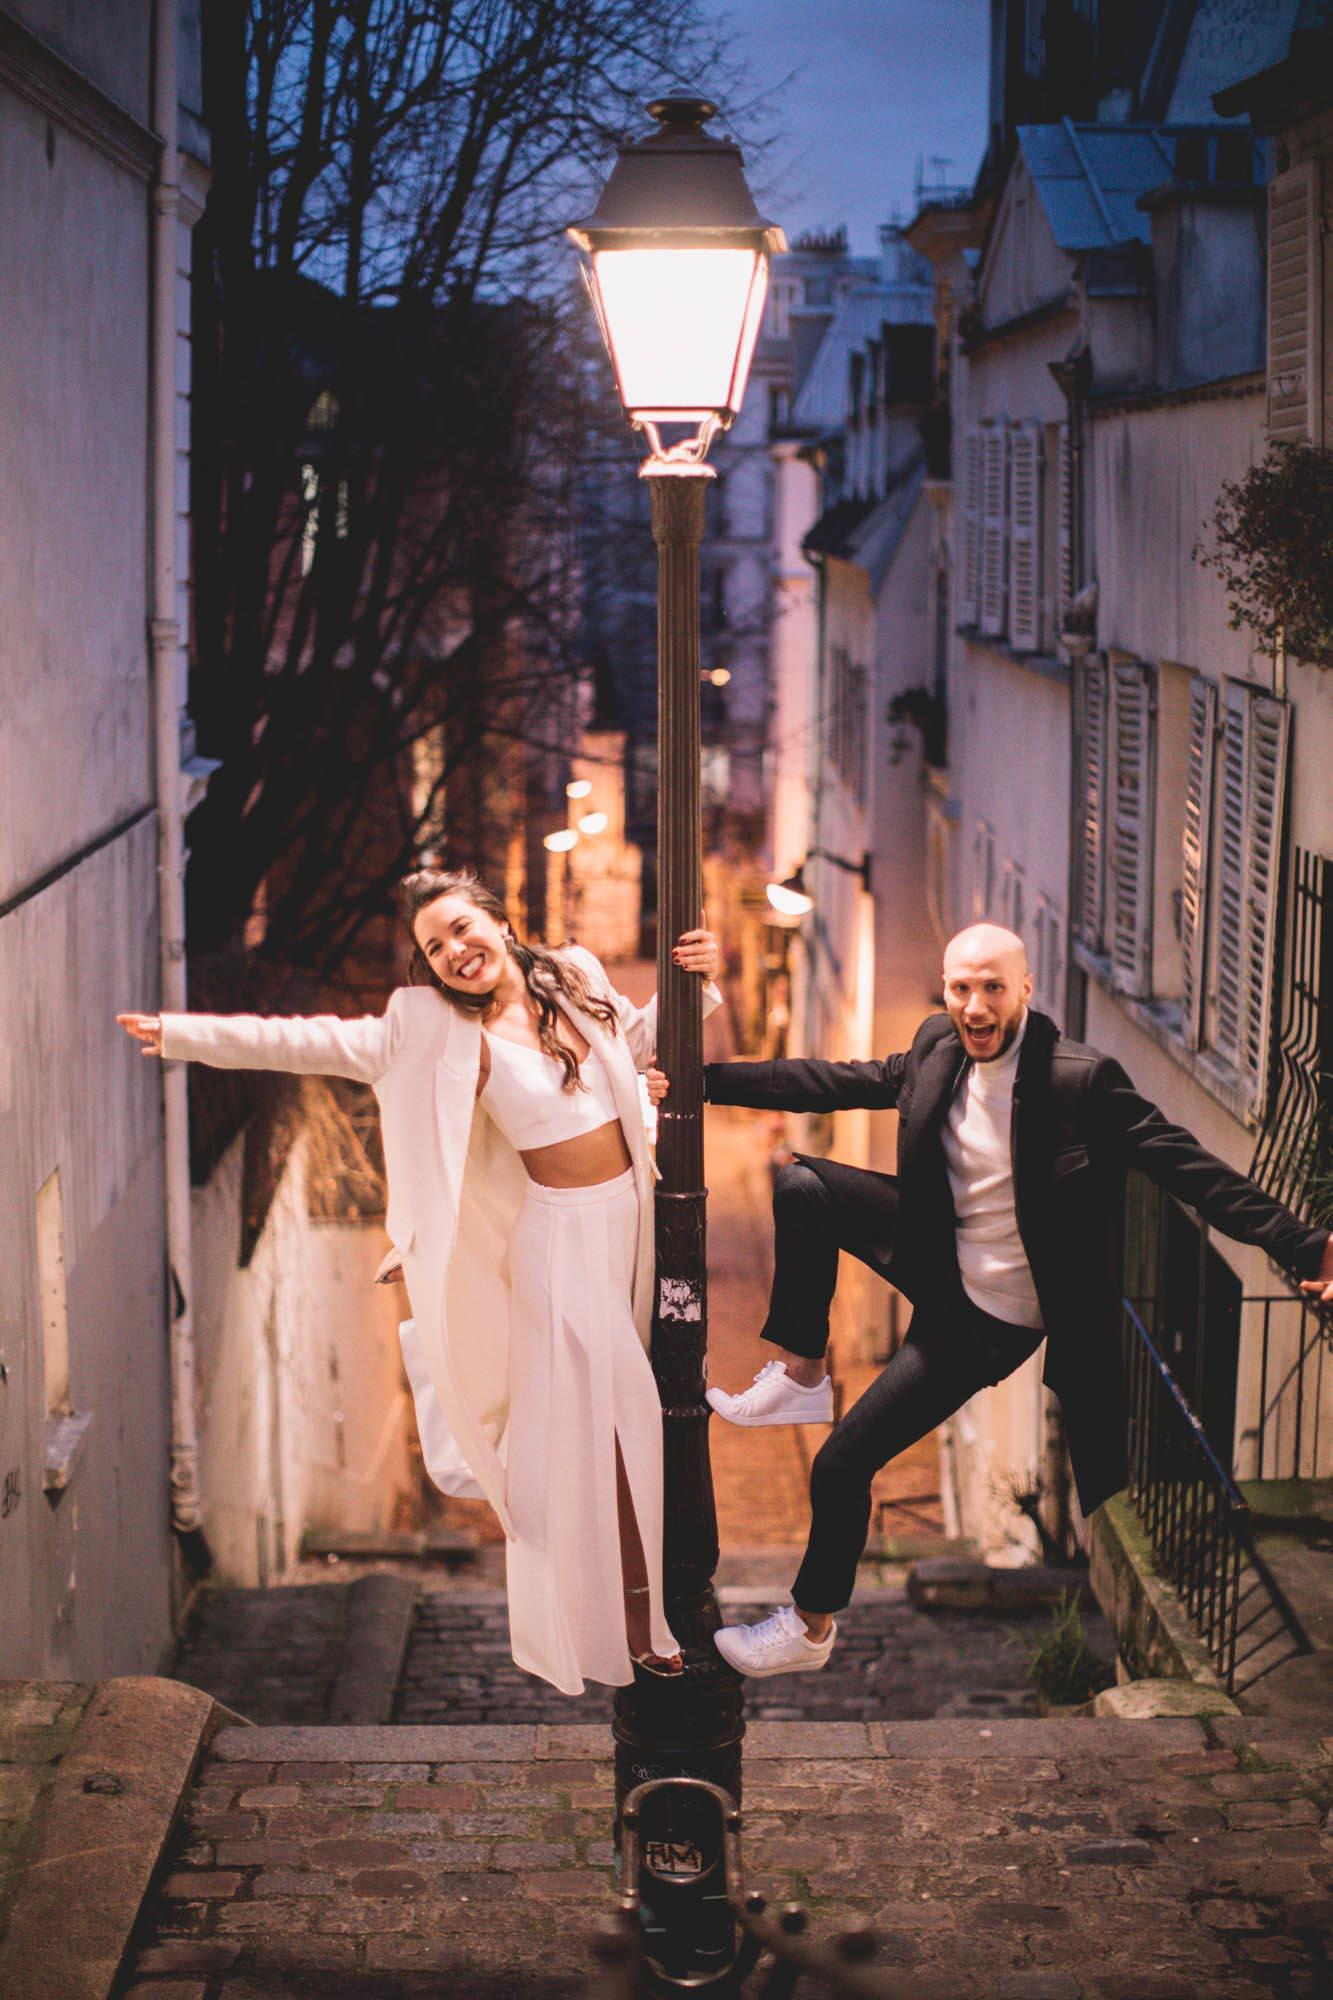 MIMI + JON_PIGALLE HOTEL_PARIS_PHOTOGRAPHE_MARIAGE_LES BANDITS-4